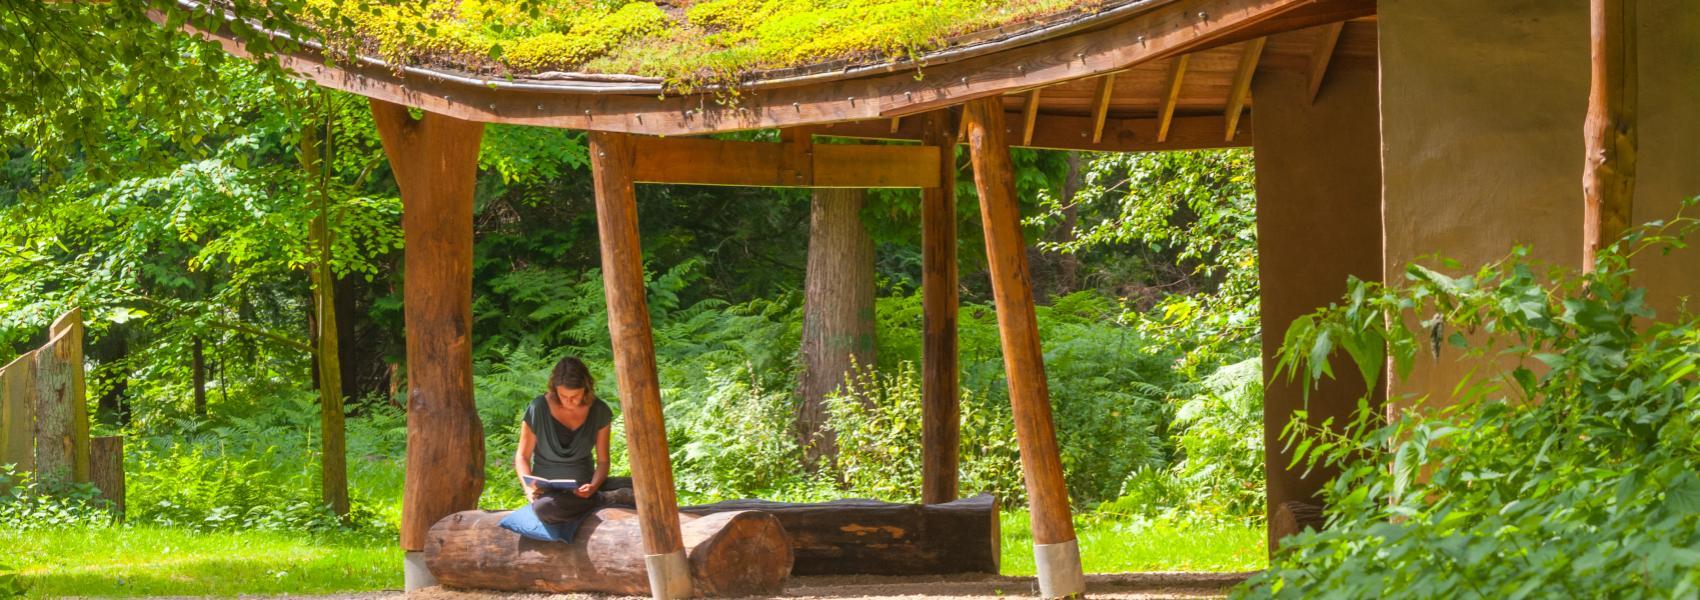 Boshut ingang Arboretum Heverleebos